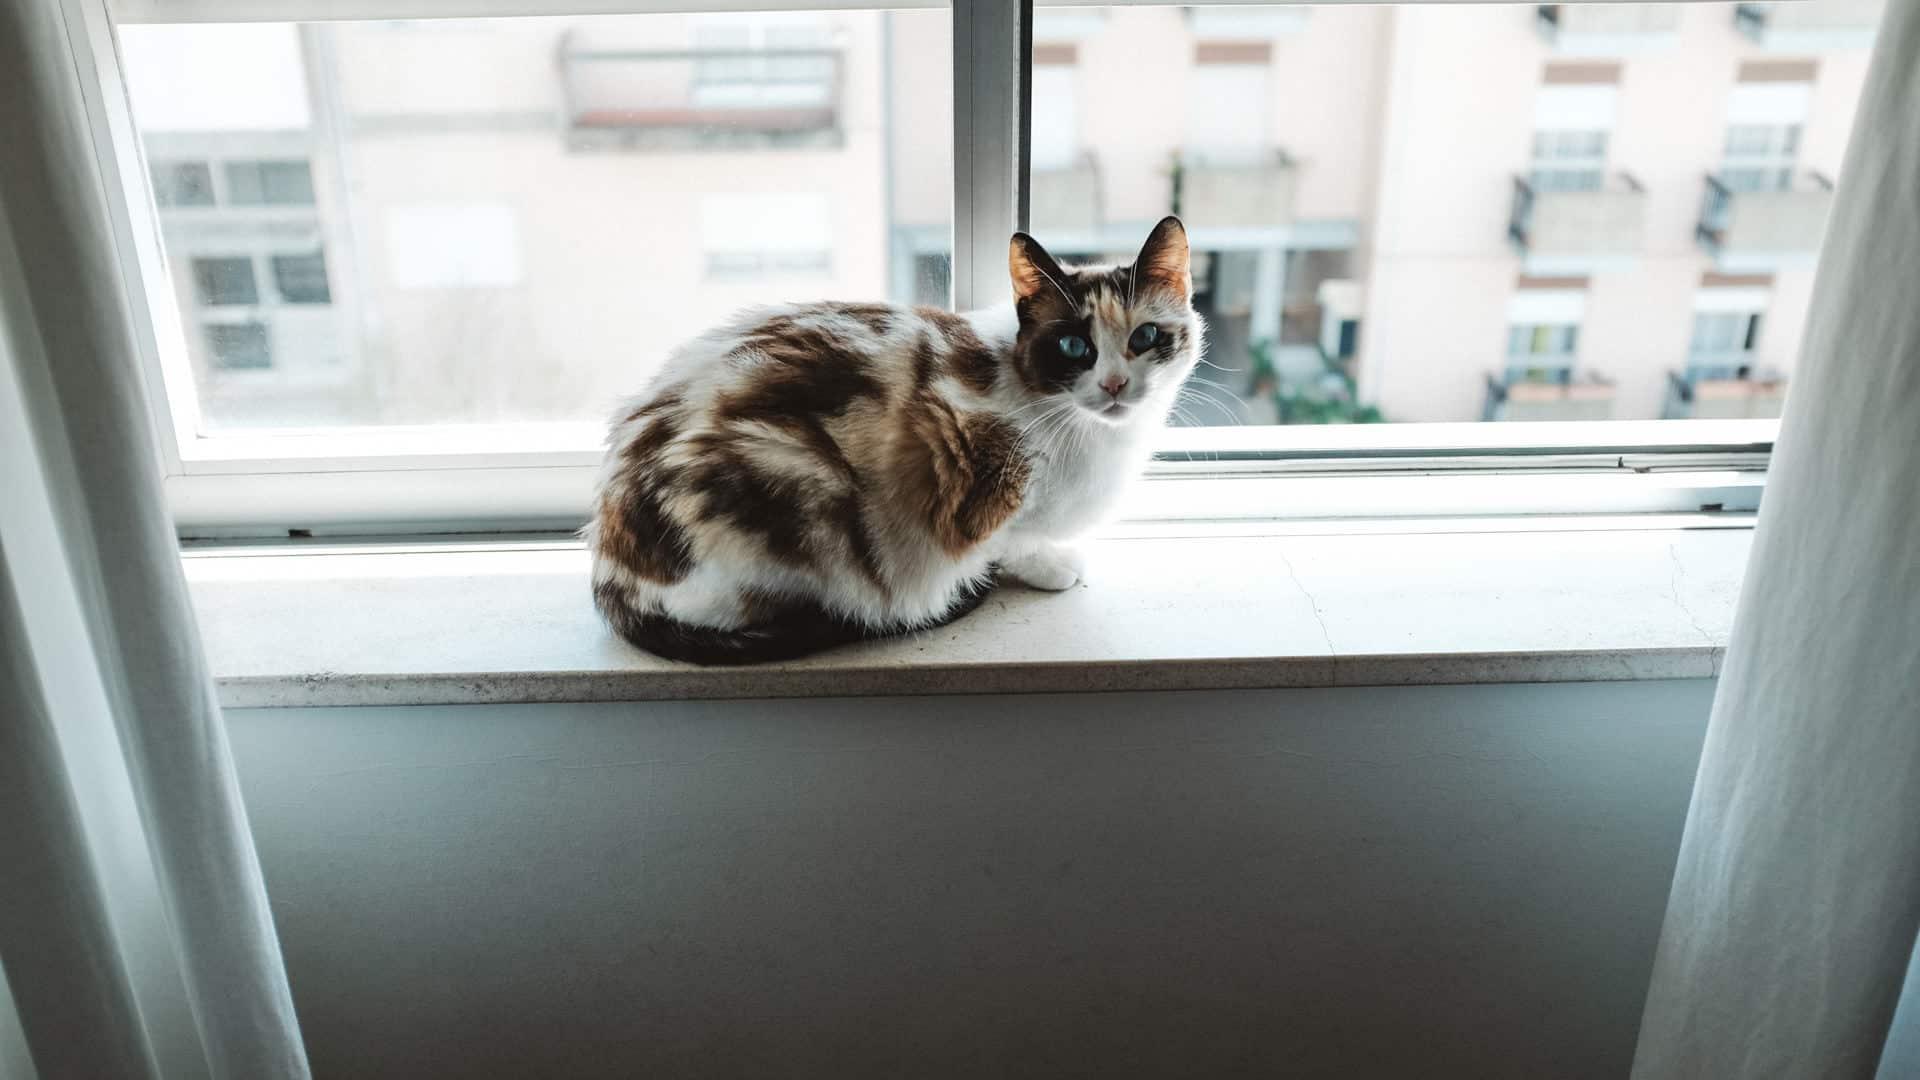 Cat on a window